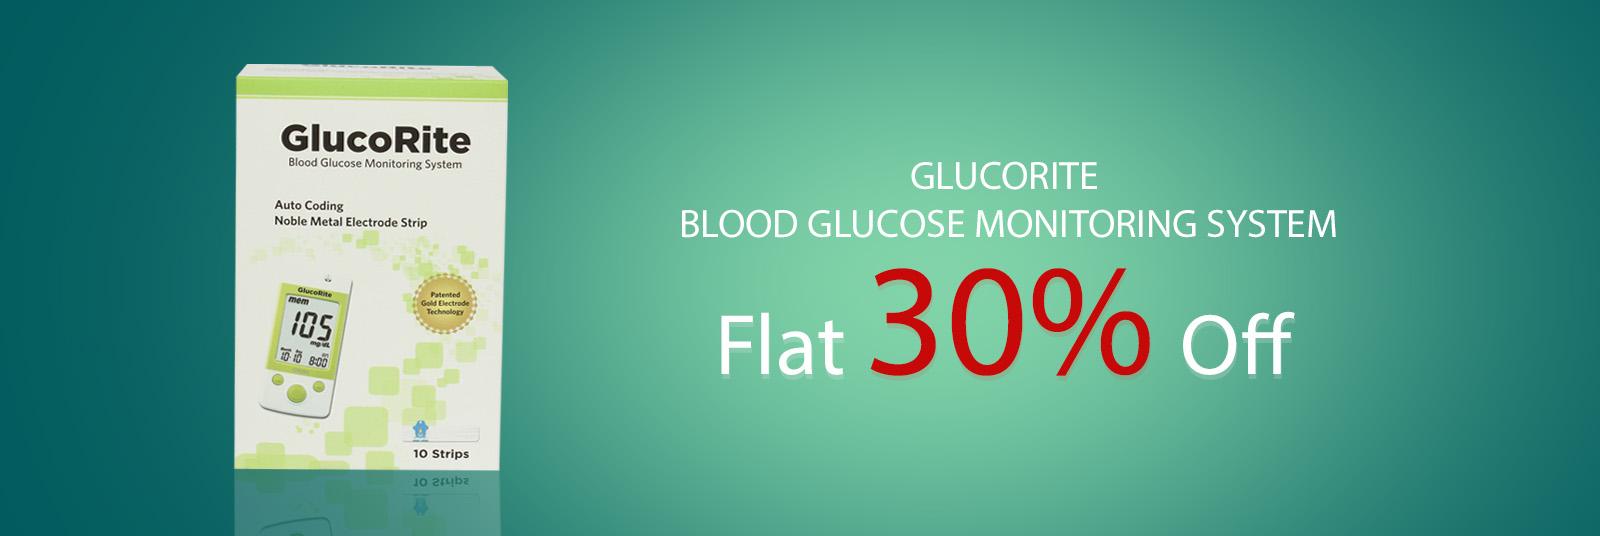 Glucorite